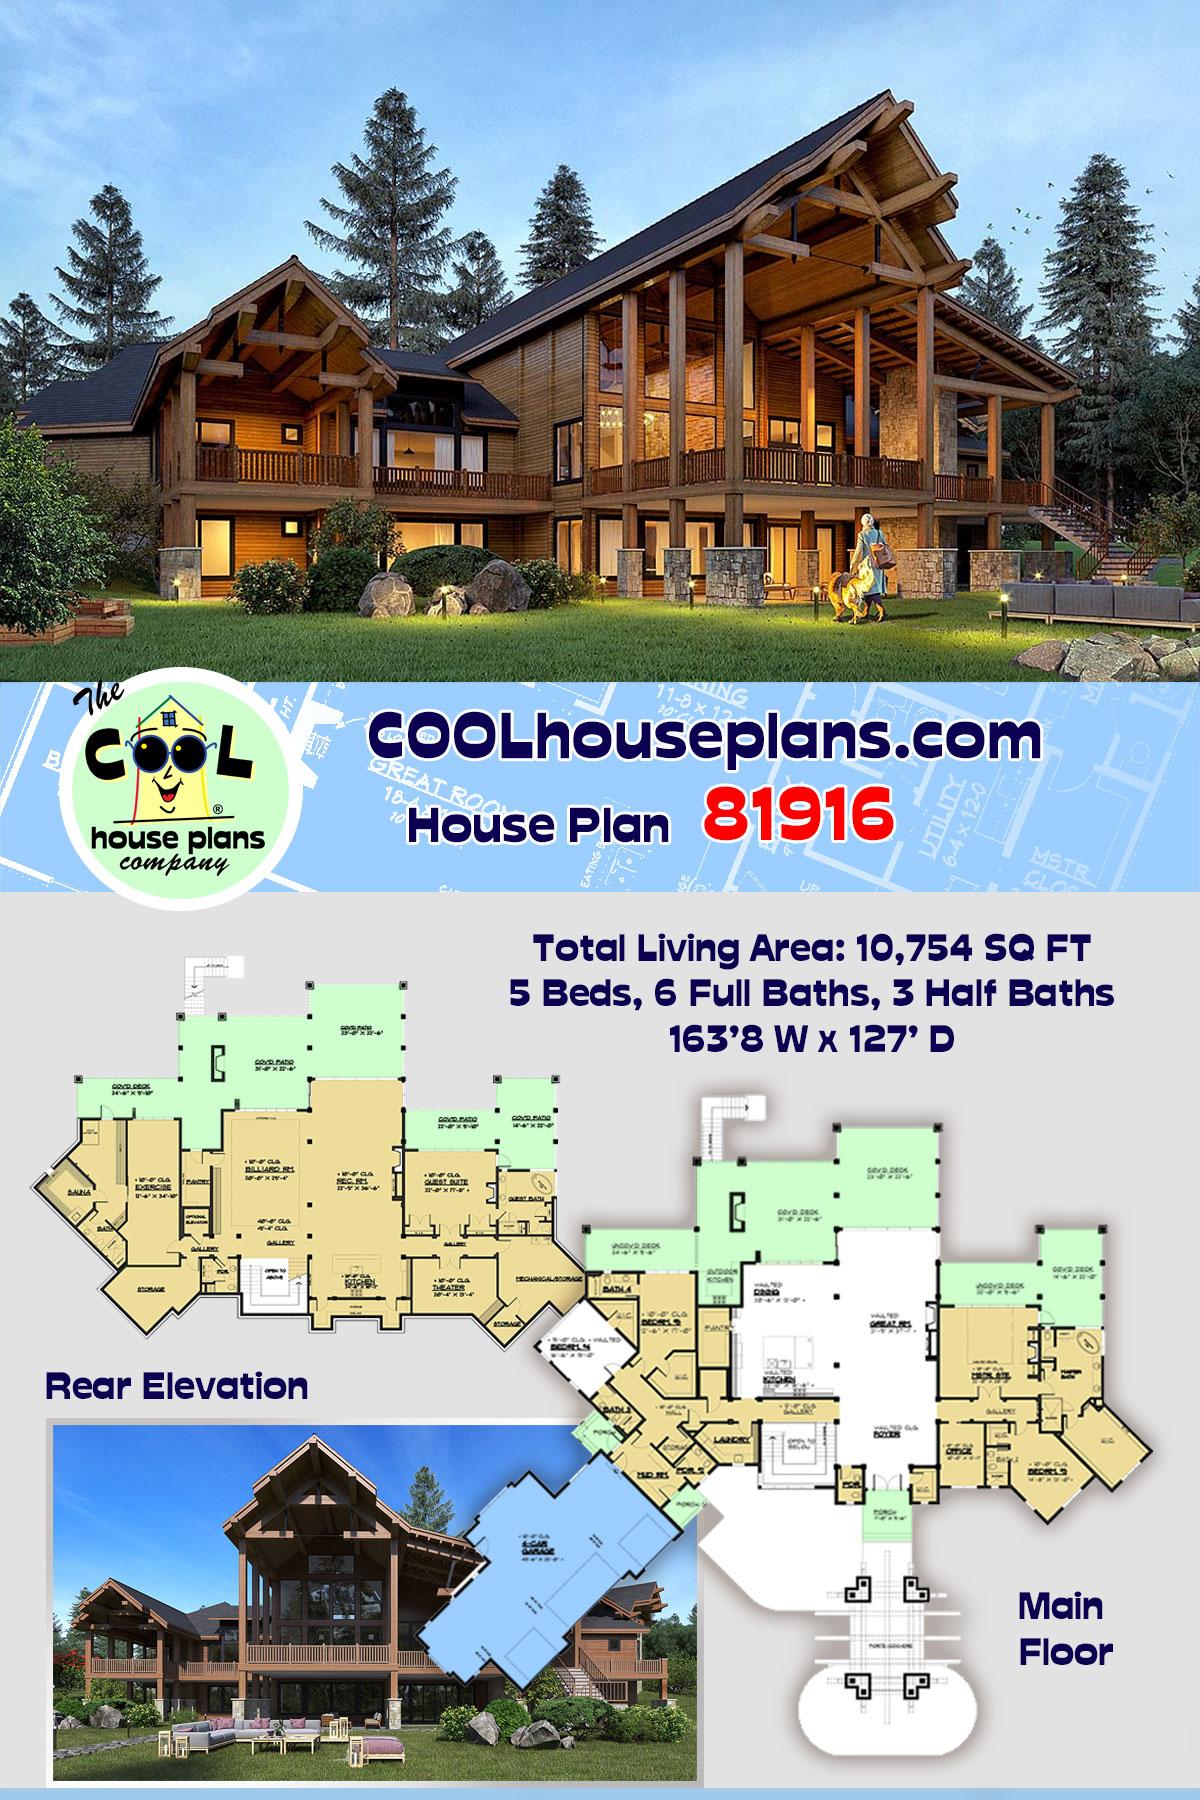 Craftsman, Log House Plan 81916 with 5 Beds, 9 Baths, 4 Car Garage